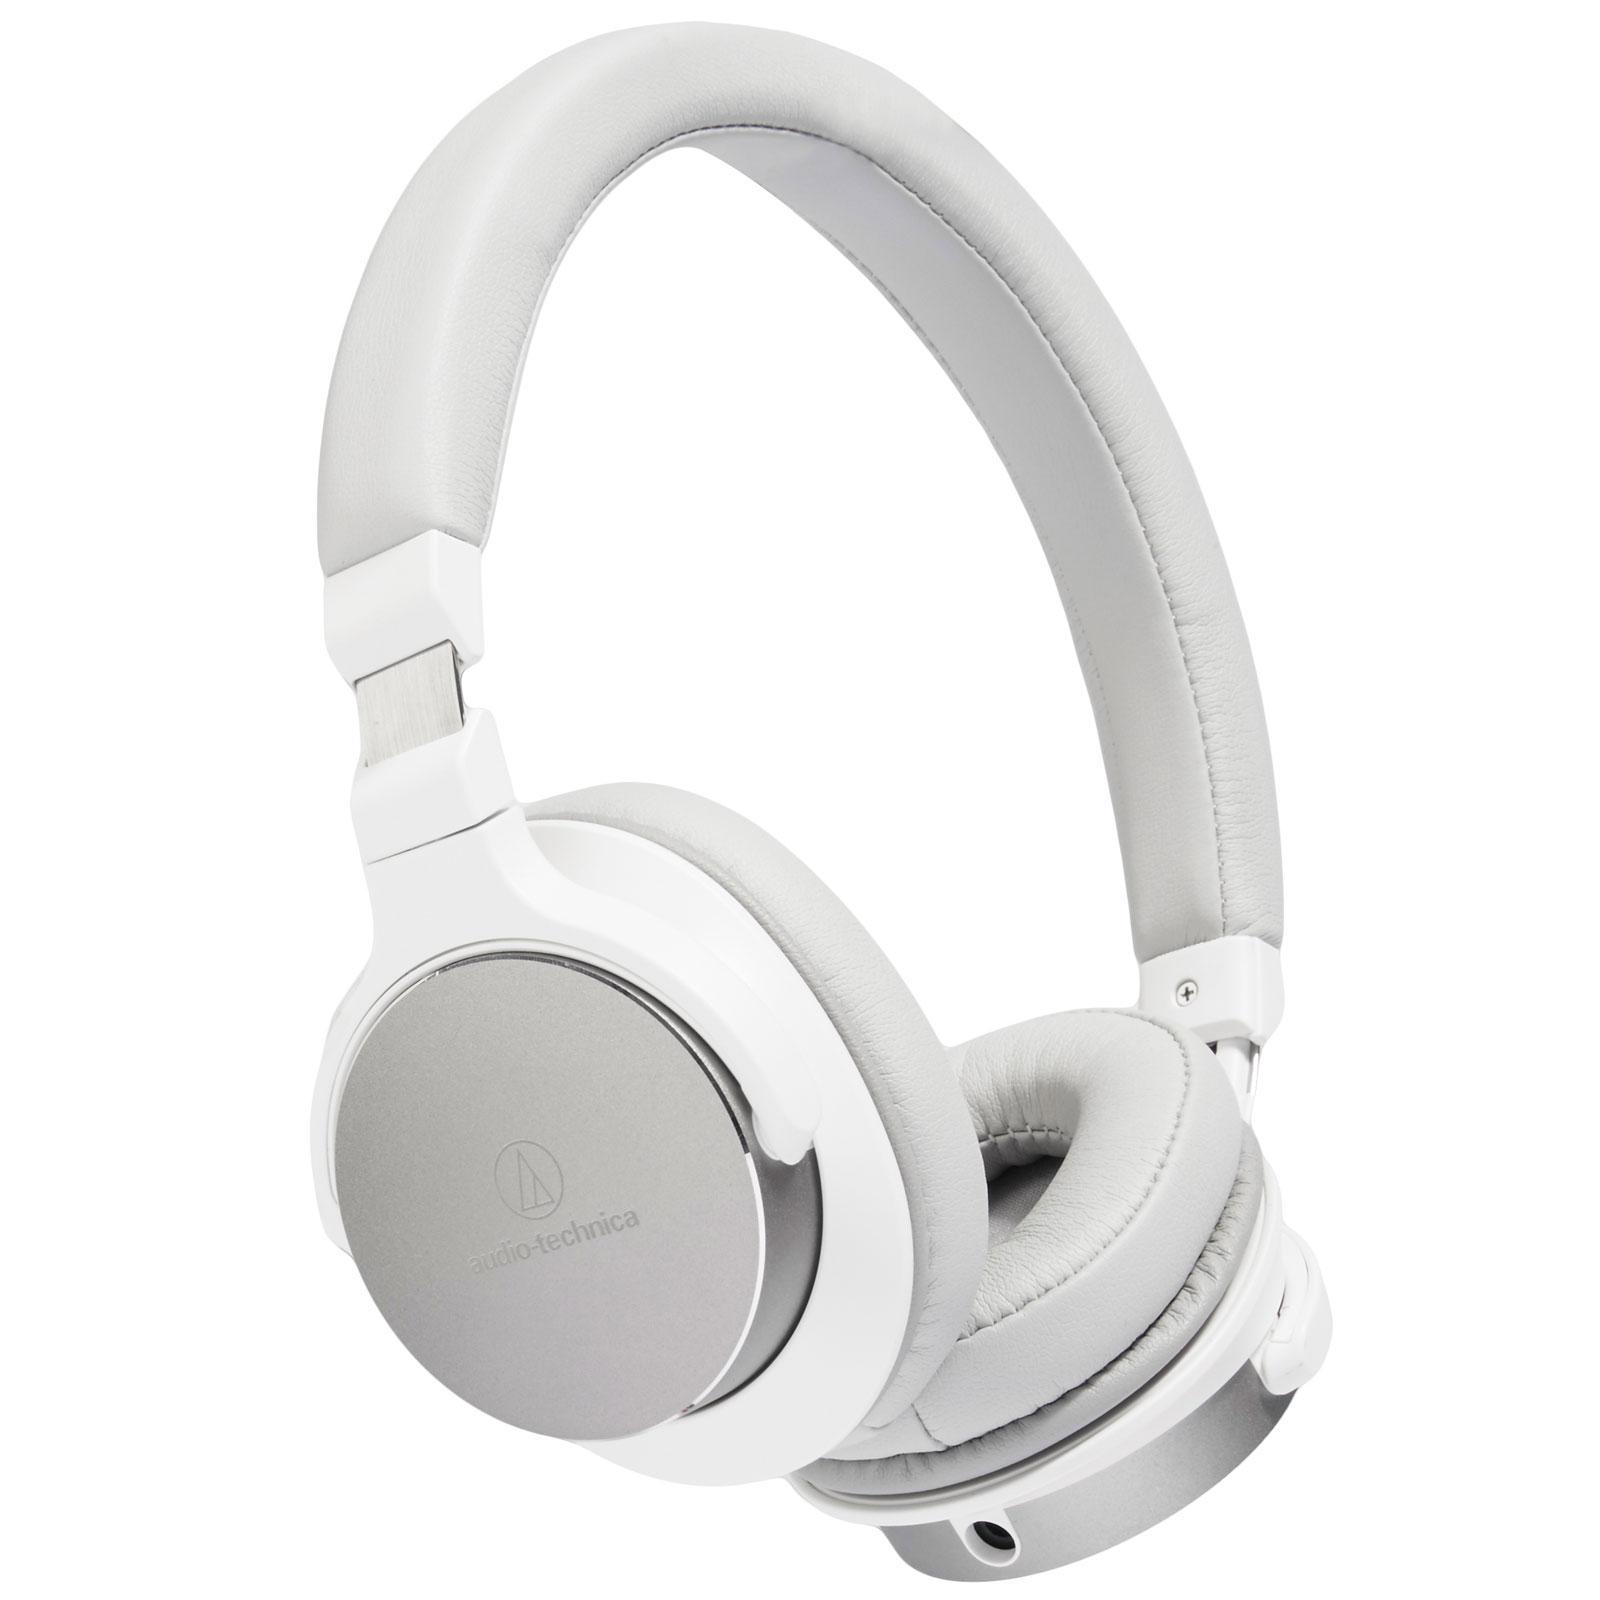 audio technica ath sr5 blanc casque audio technica sur. Black Bedroom Furniture Sets. Home Design Ideas